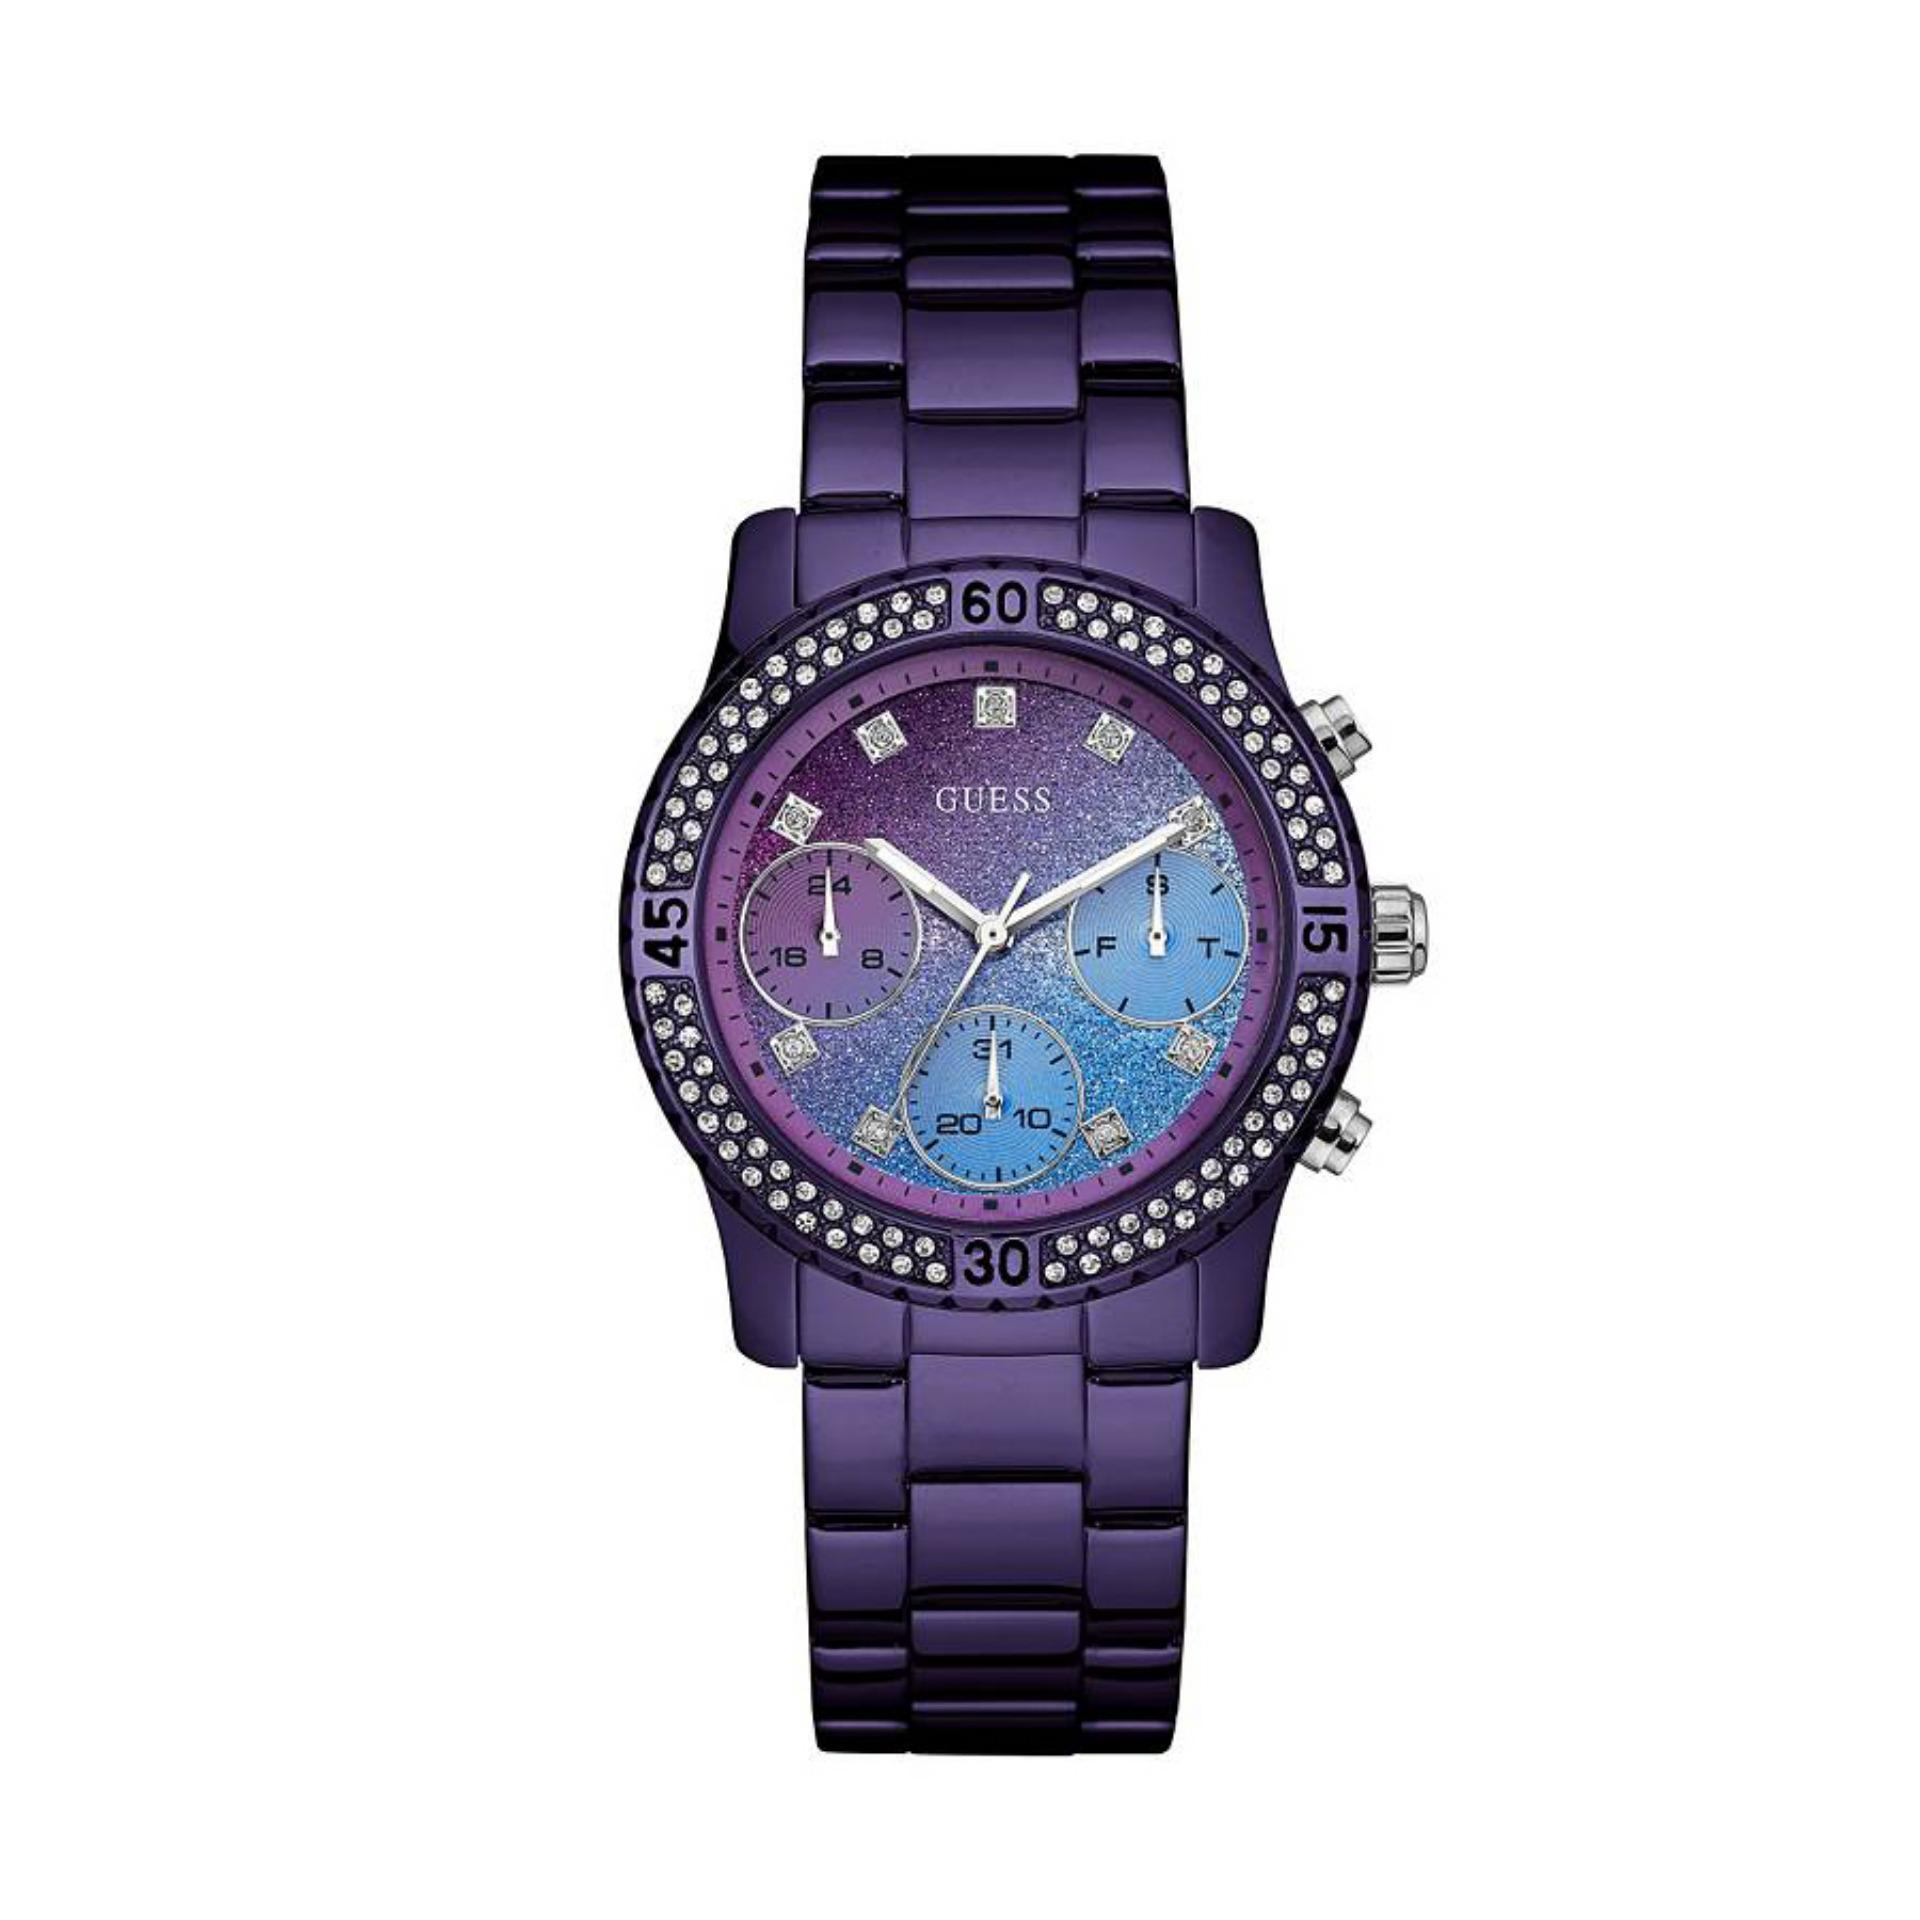 Guess Jam Tangan Pria Hitam Stainless Steel W0522g2 Daftar Alexandre Christie Ac668lw Silver Wanita Purple